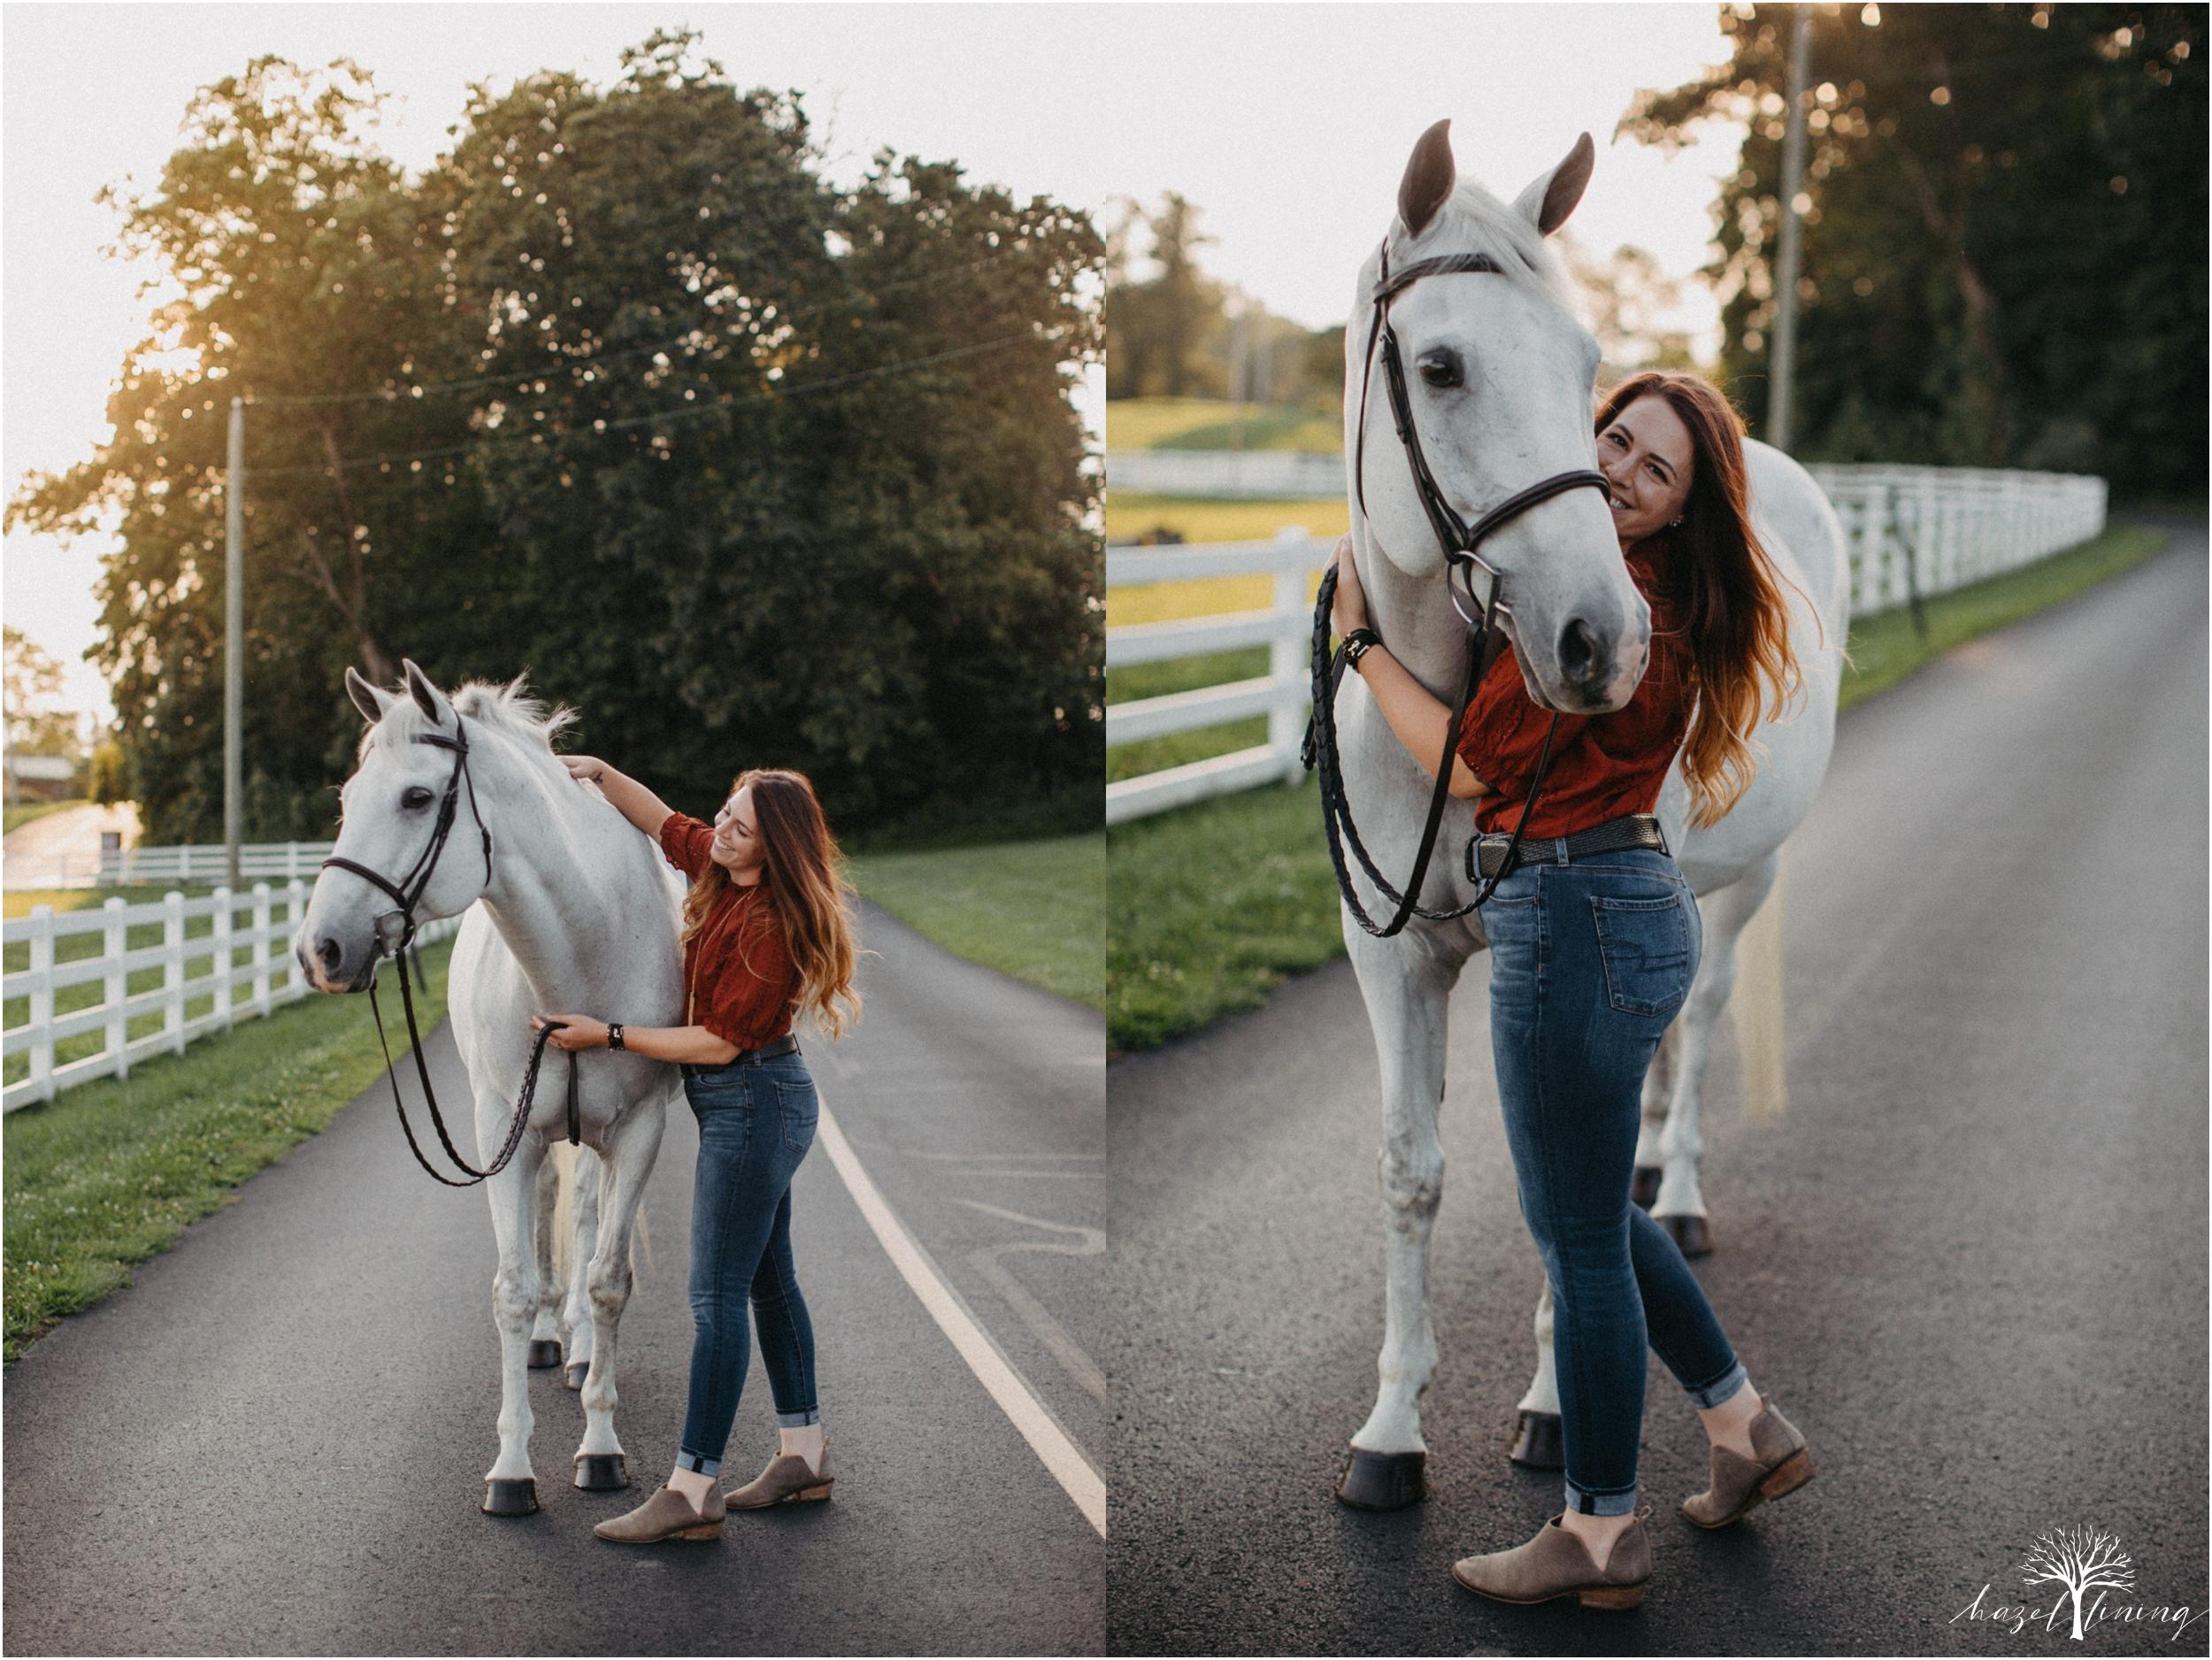 taylor-adams-and-horse-delaware-valley-university-delval-summer-equestrian-portrait-session-hazel-lining-photography-destination-elopement-wedding-engagement-photography_0016.jpg